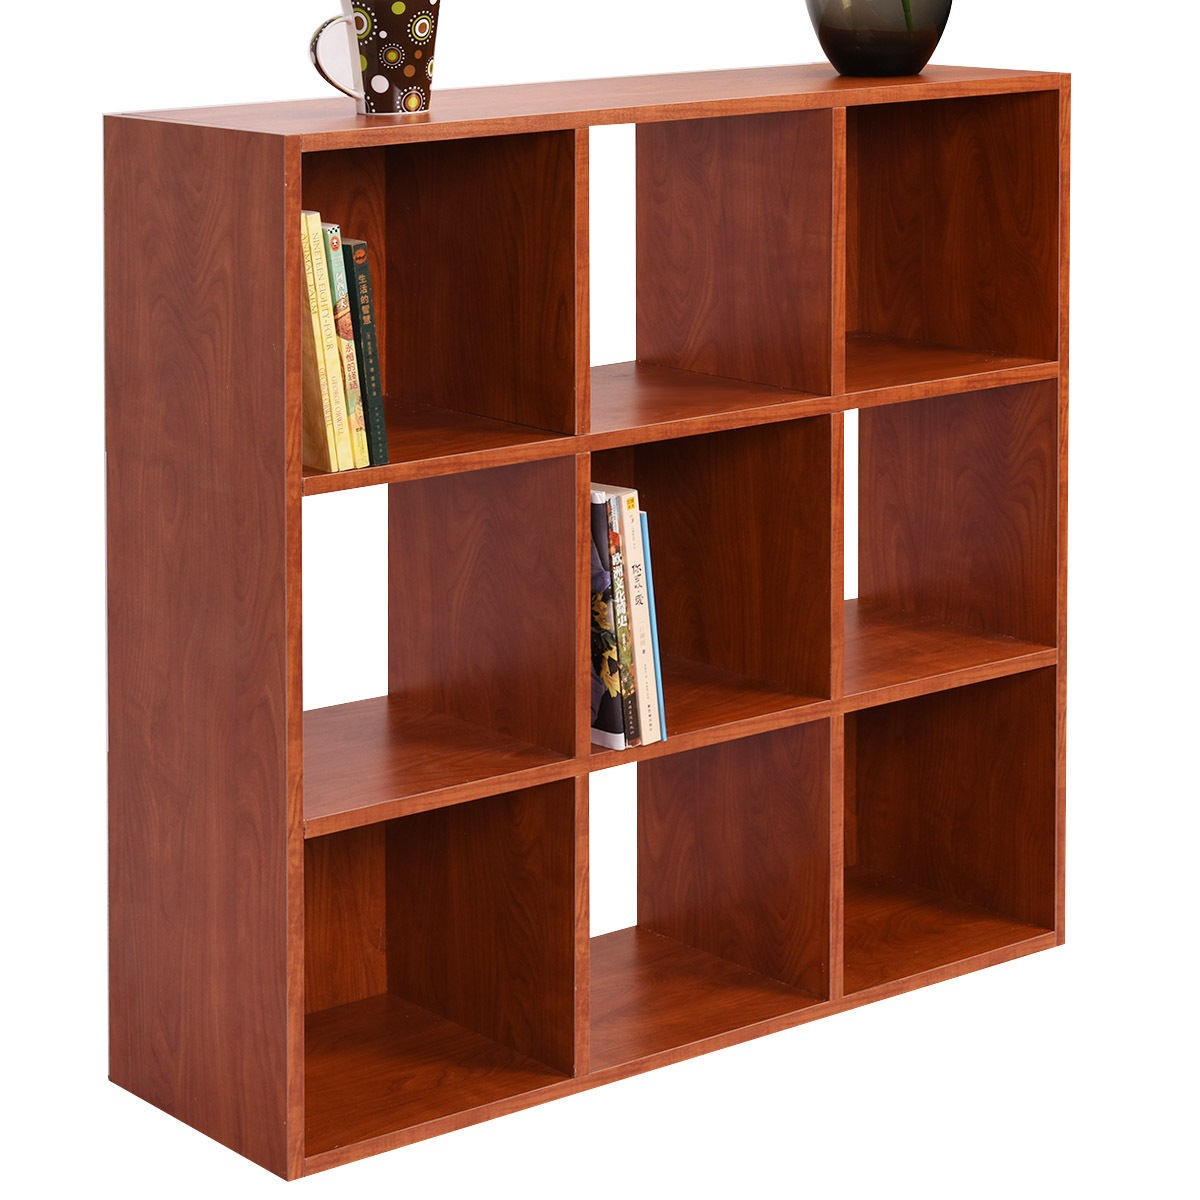 office furniture shelves. office furniture shelves shelving home